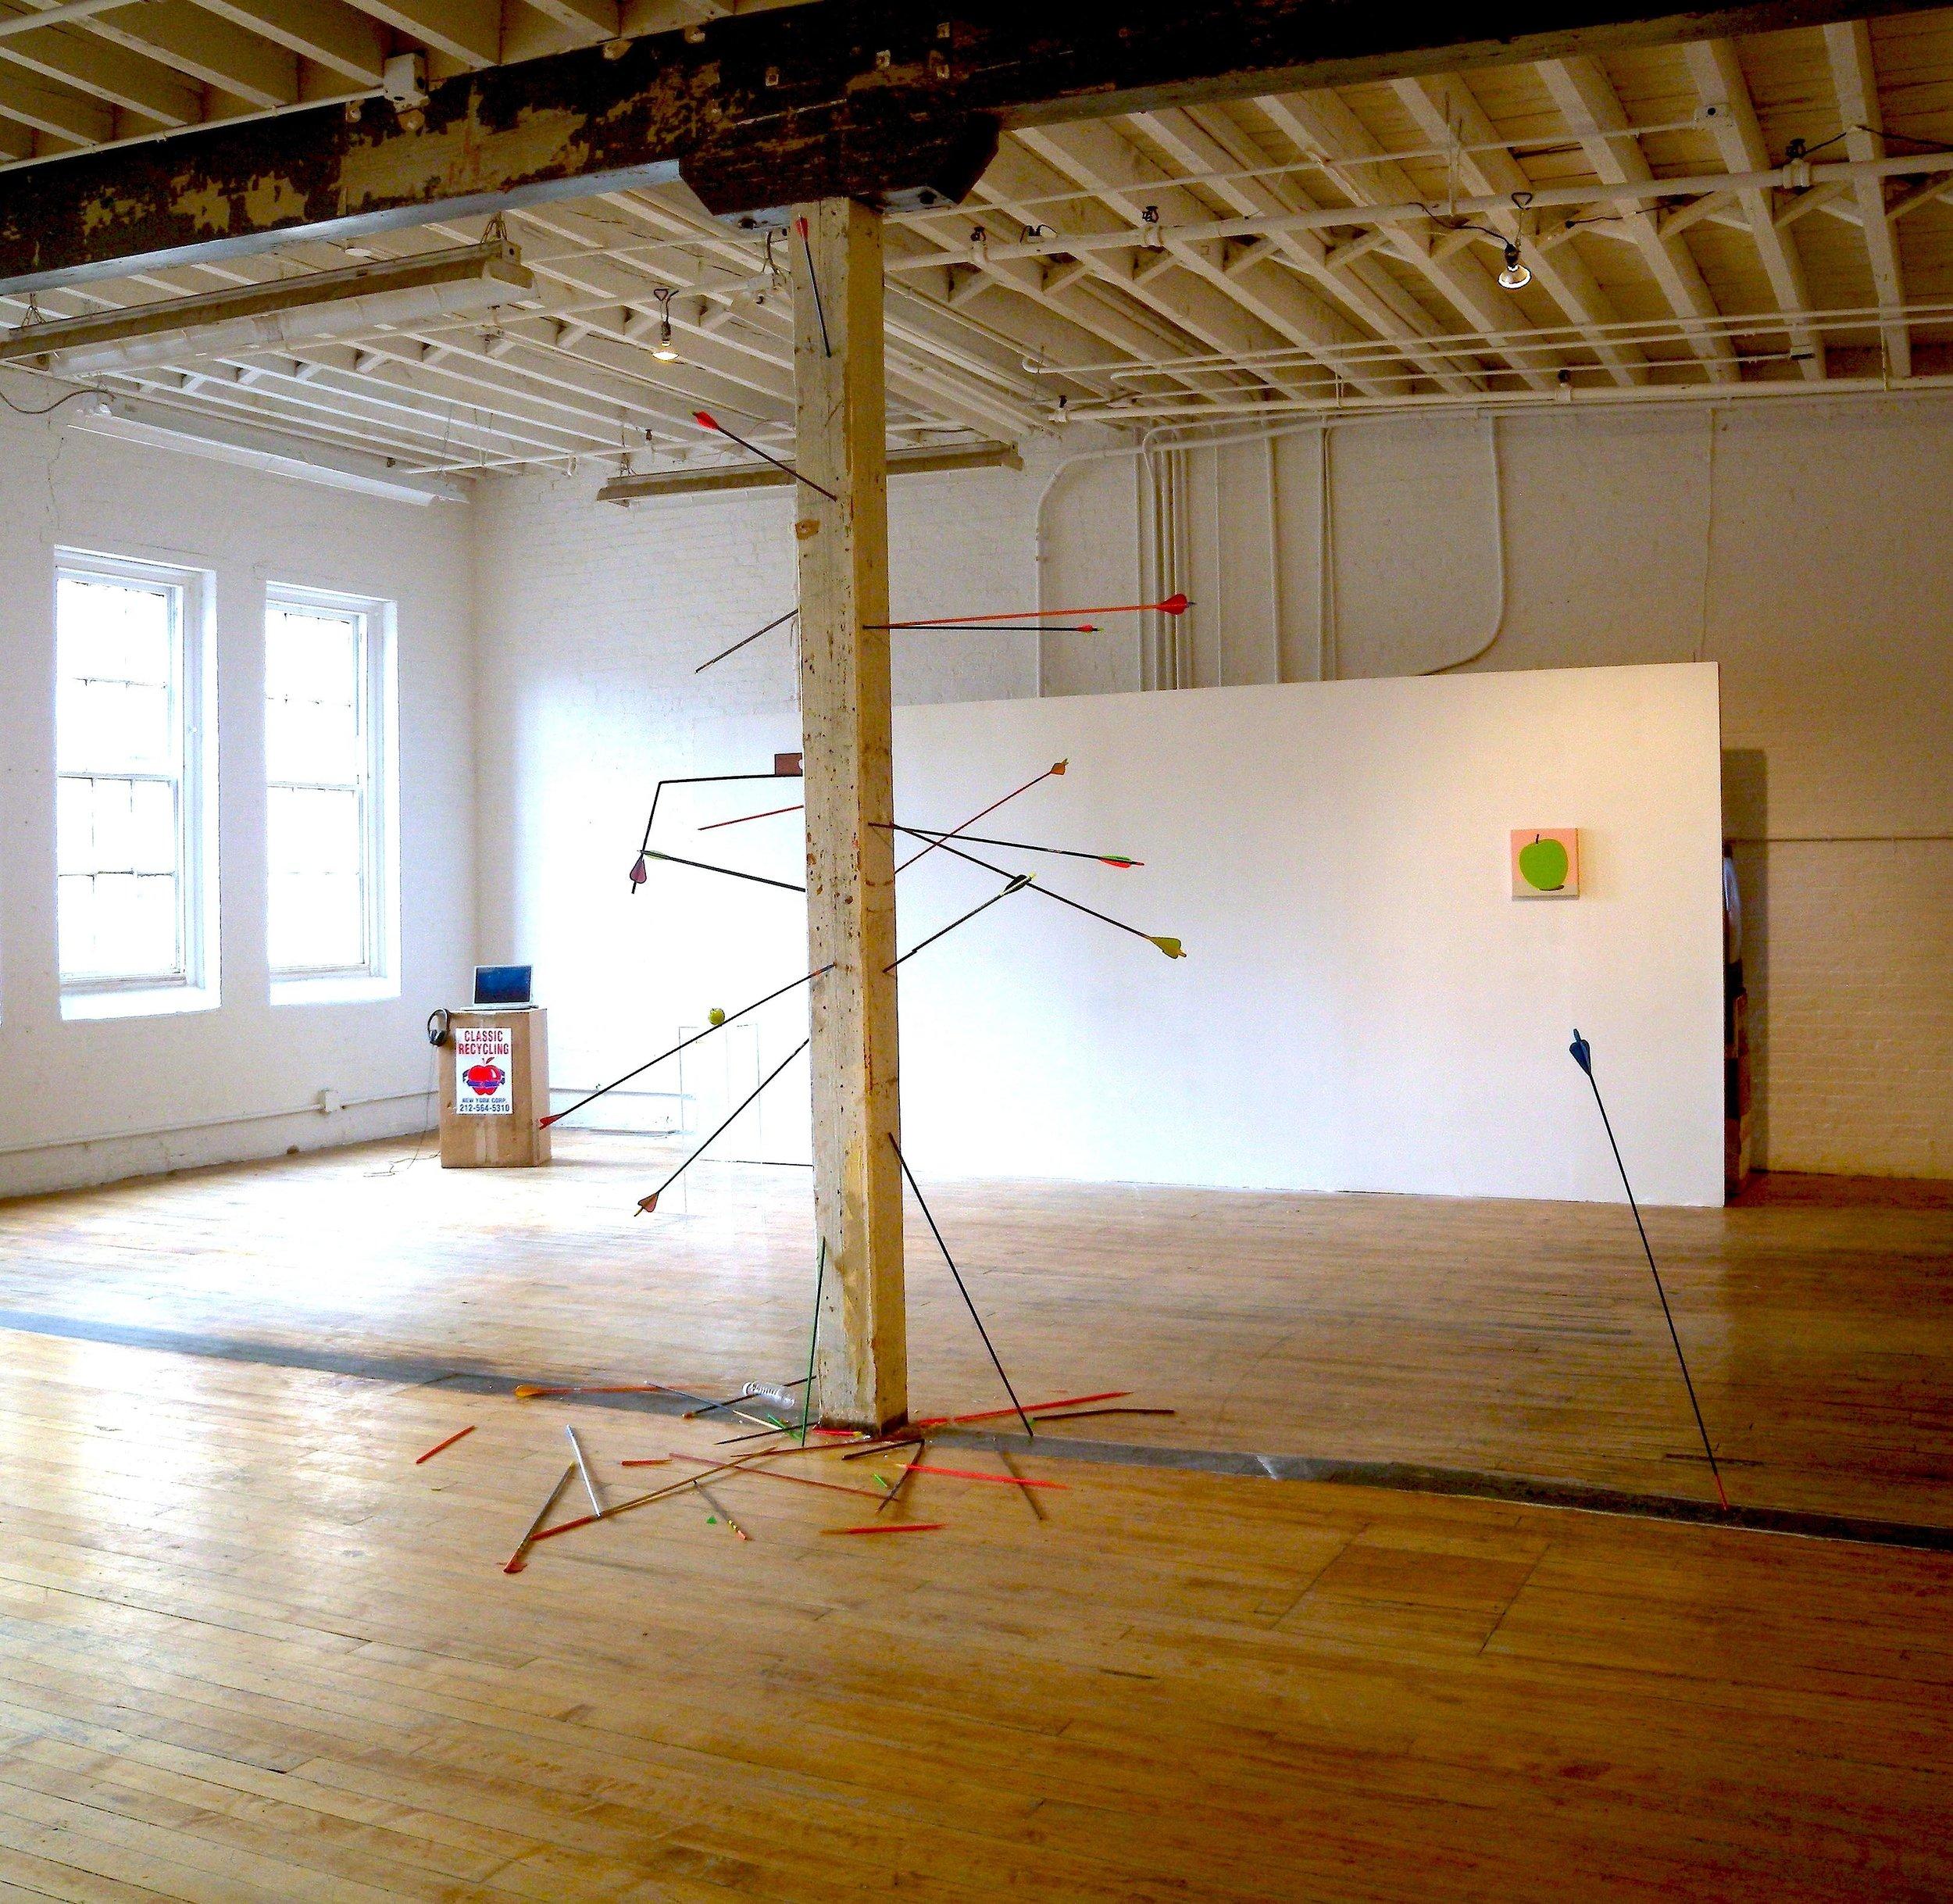 Michael Georgetti,  Arena, Star Gazing,  2010, play dough, aluminium, arrows, rope and tape